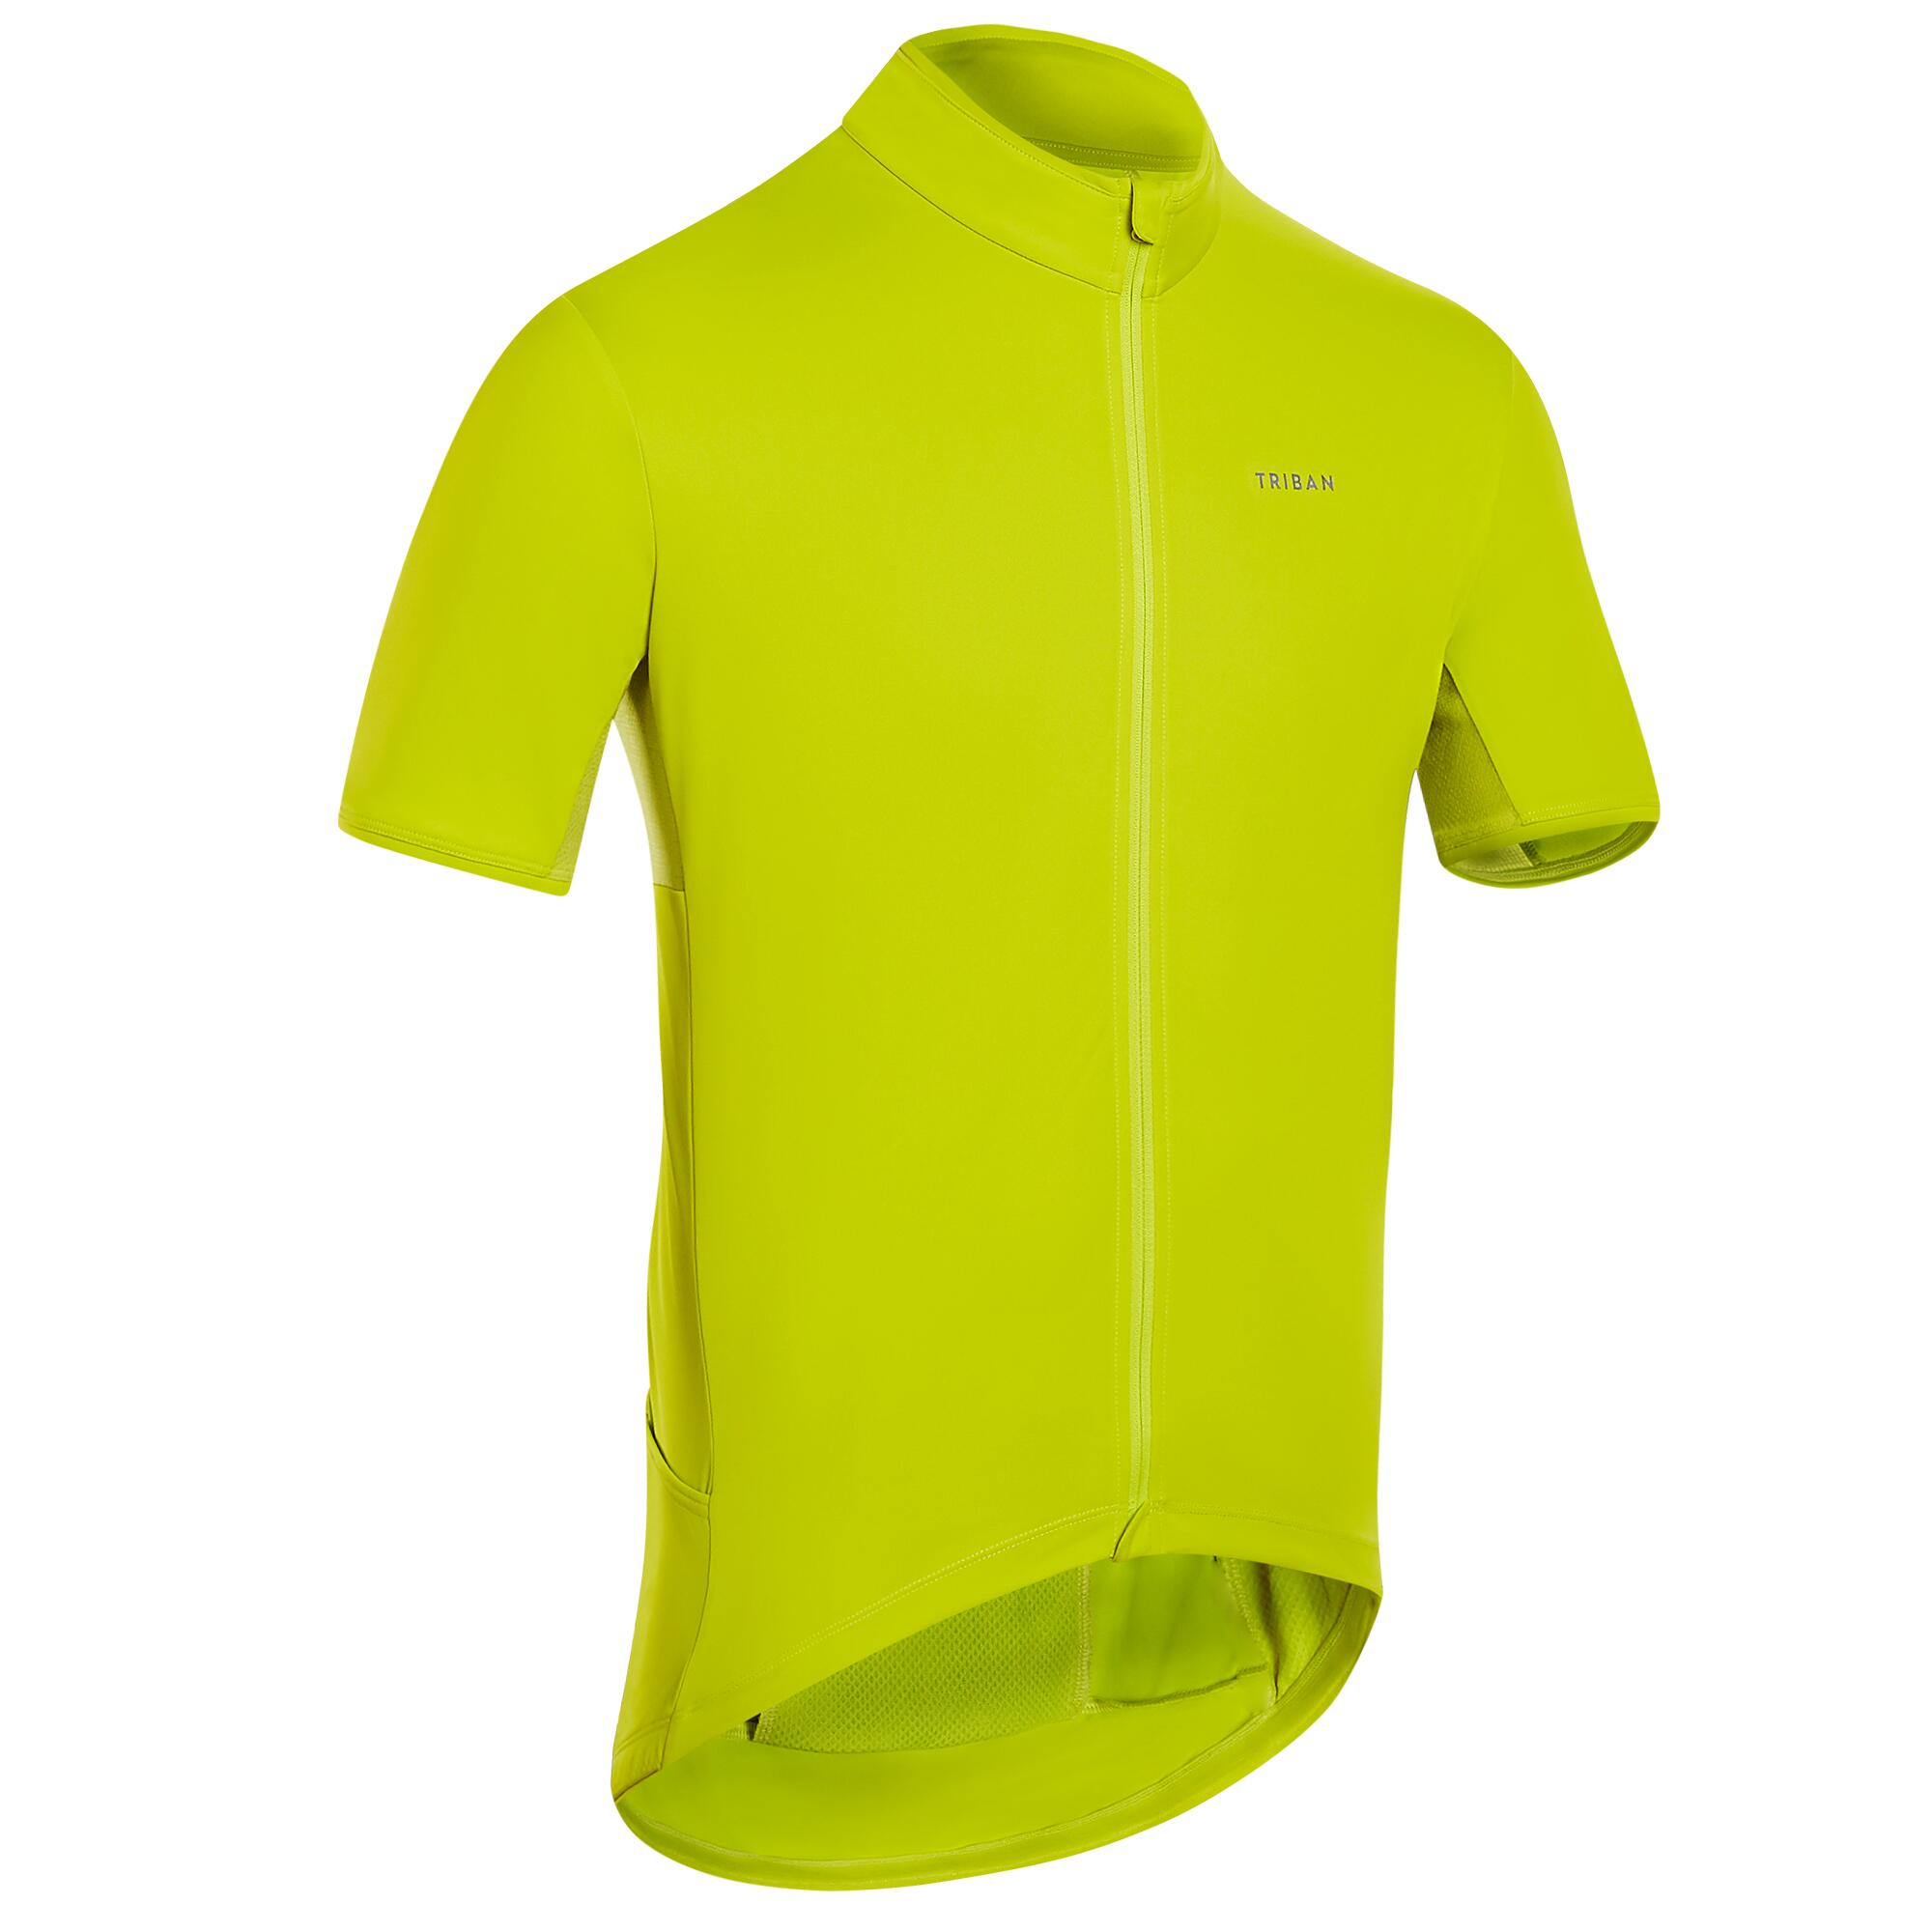 Tricou ciclism RC 500 Bărbați imagine